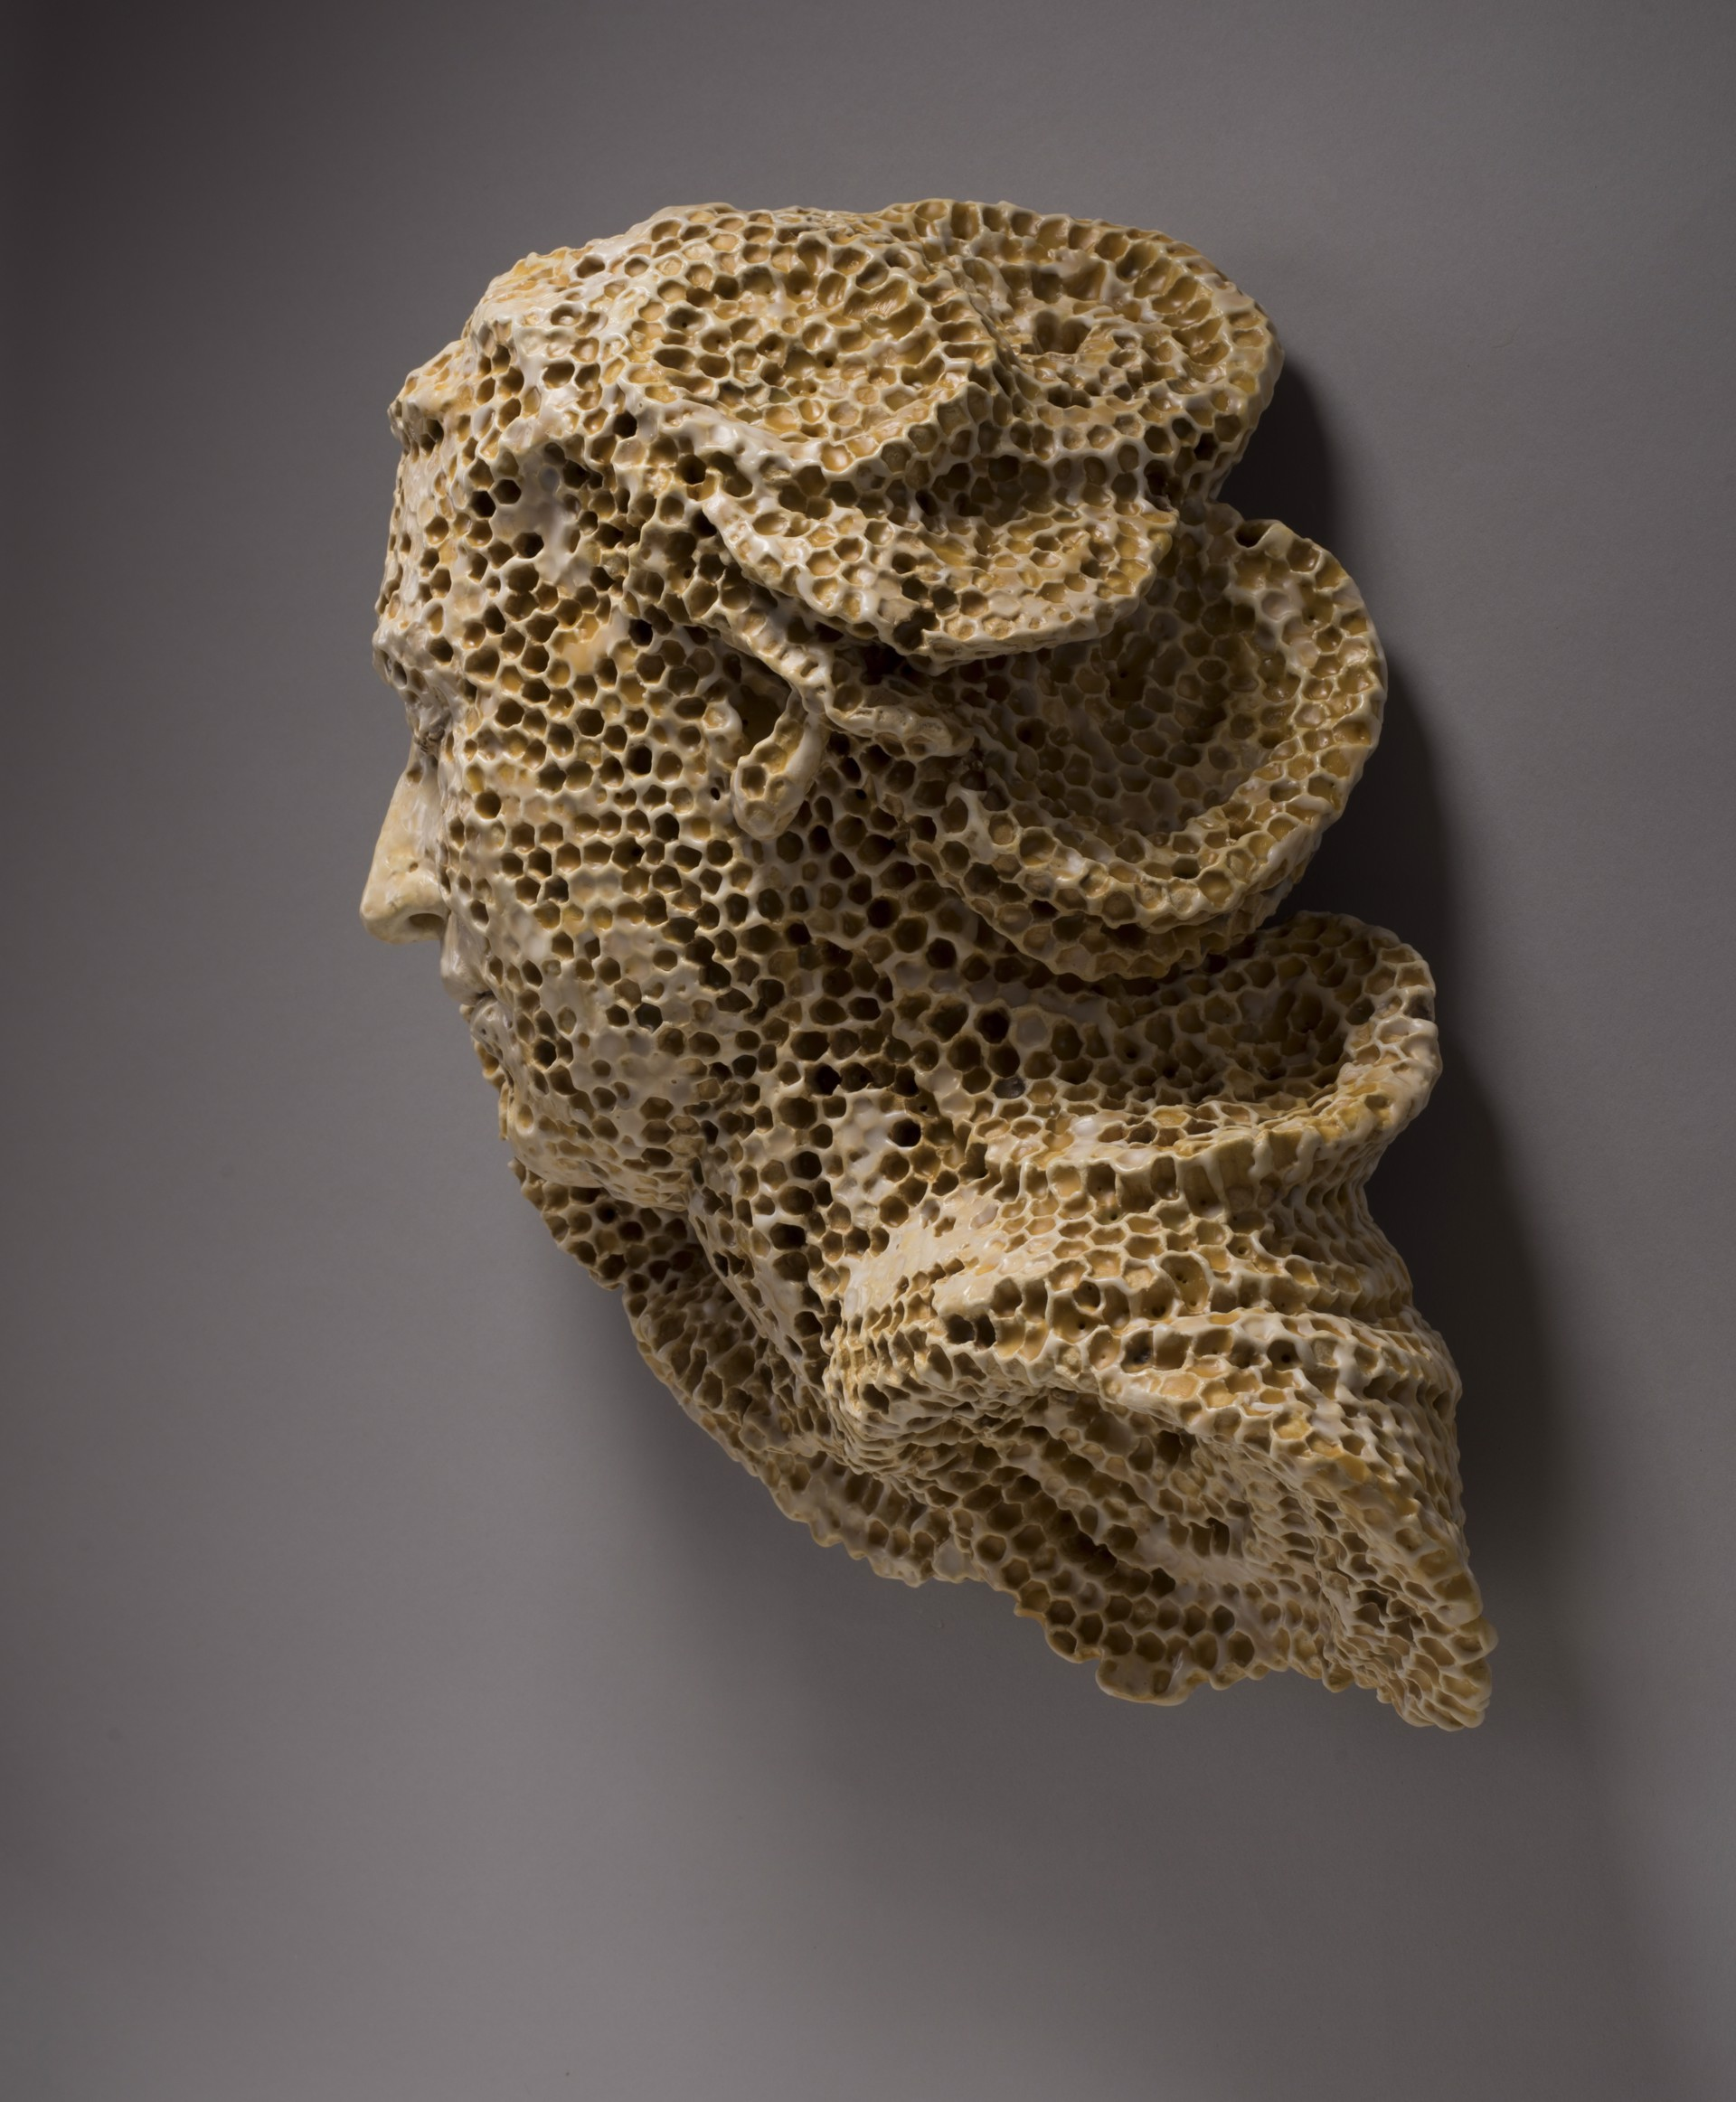 """Echo"" (Honey comb texture) by Adrian Arleo"